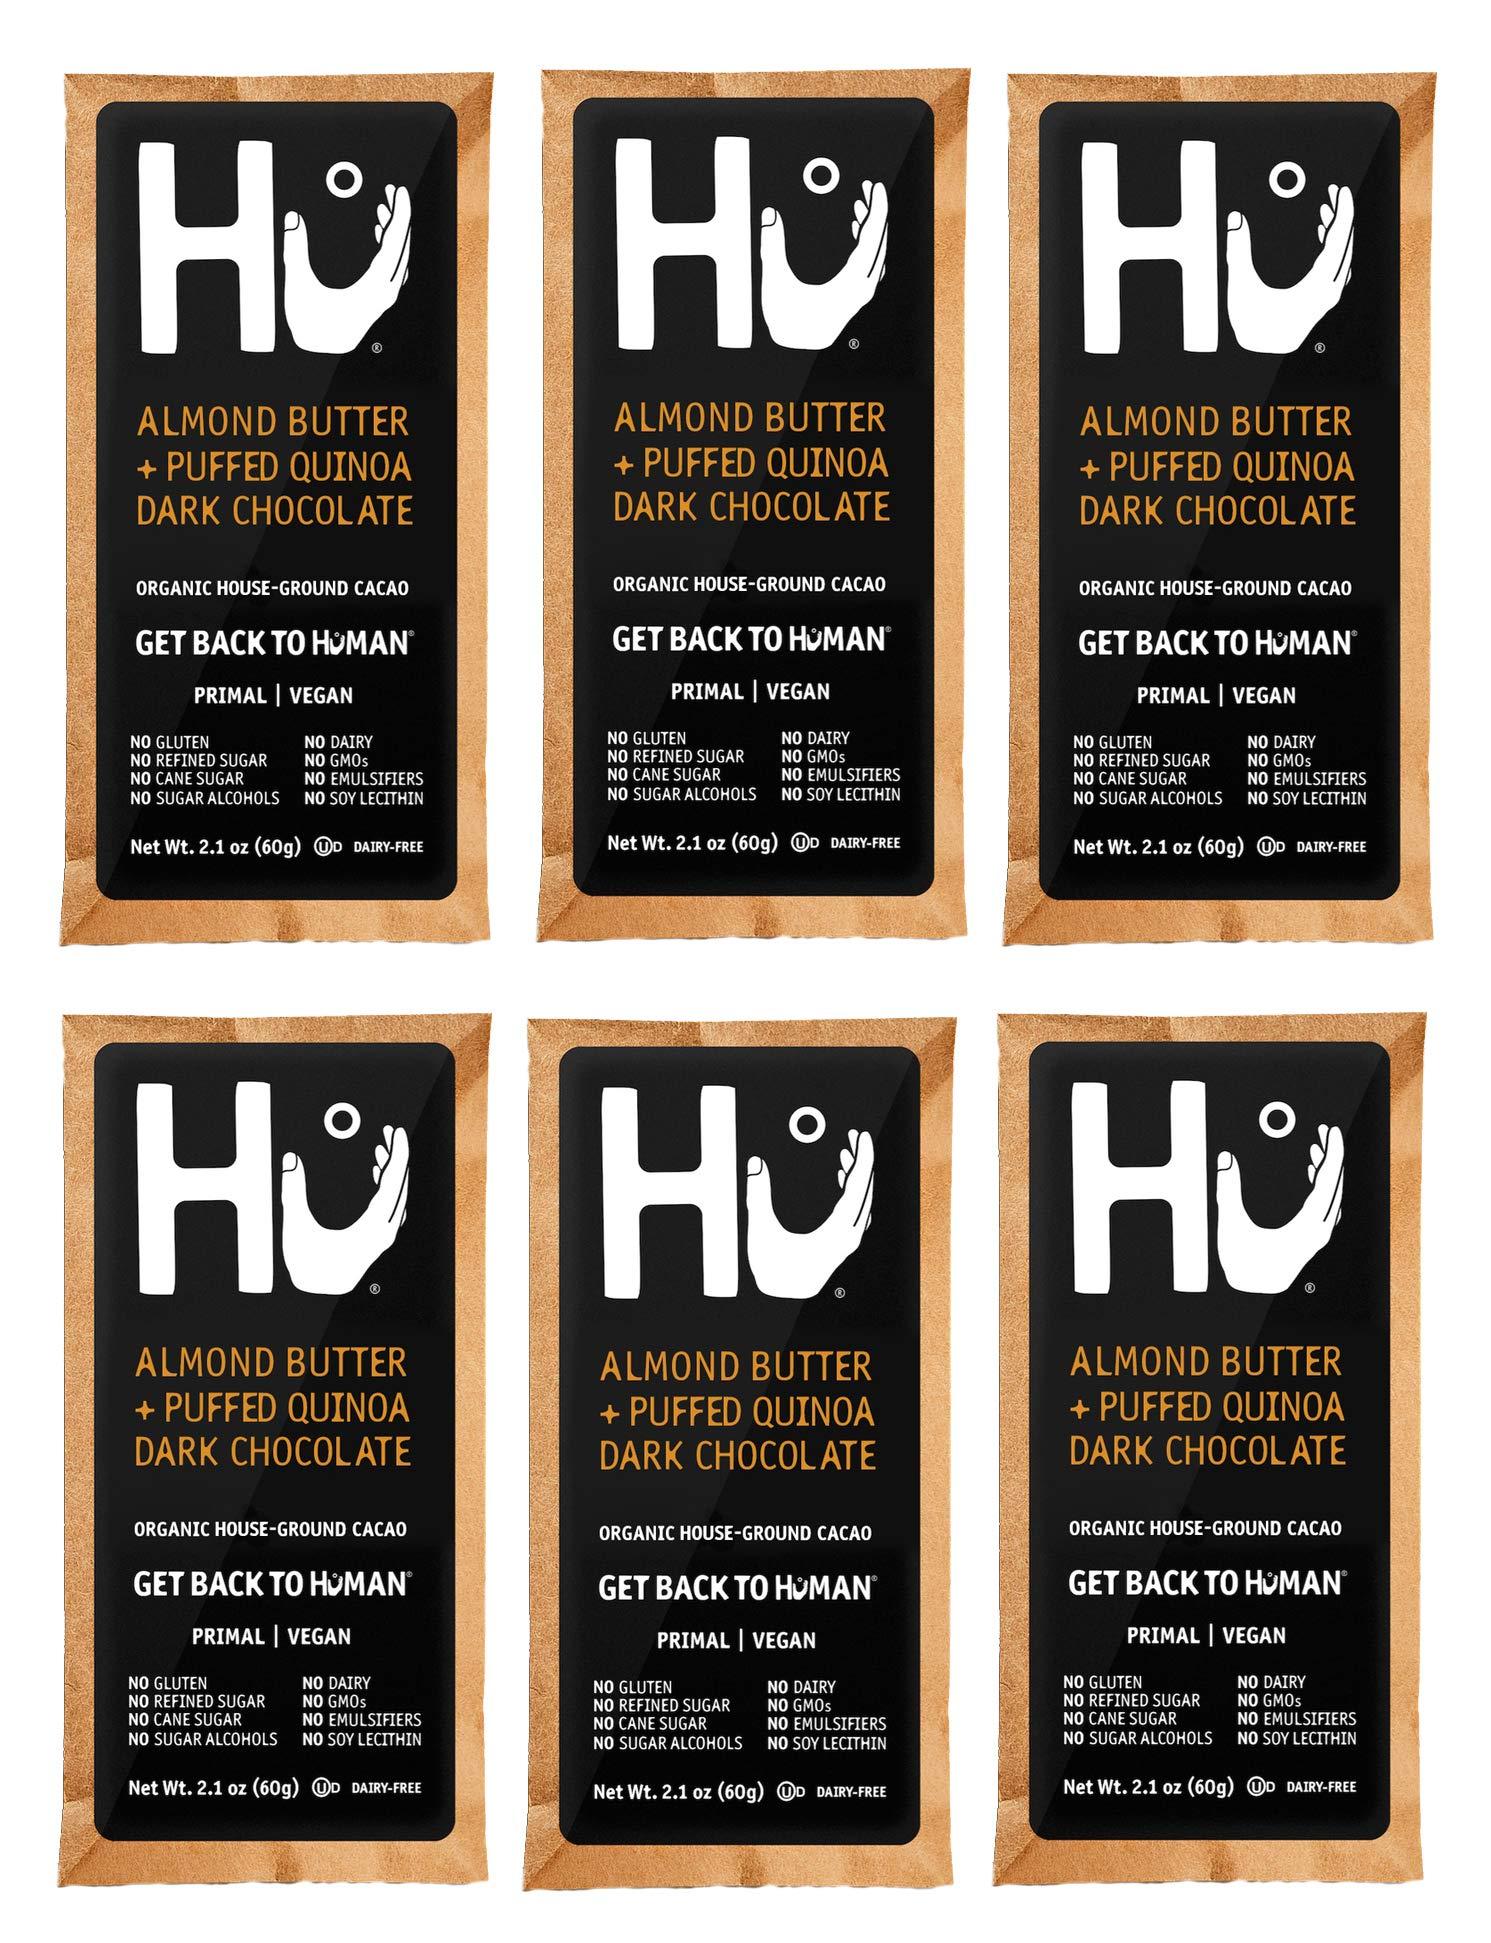 Hu Kitchen Dark Chocolate Bars, 2.1 oz, Almond Butter & Puffed Quinoa 72% Chocolate Bar (6 Pack) by Hu Kitchen